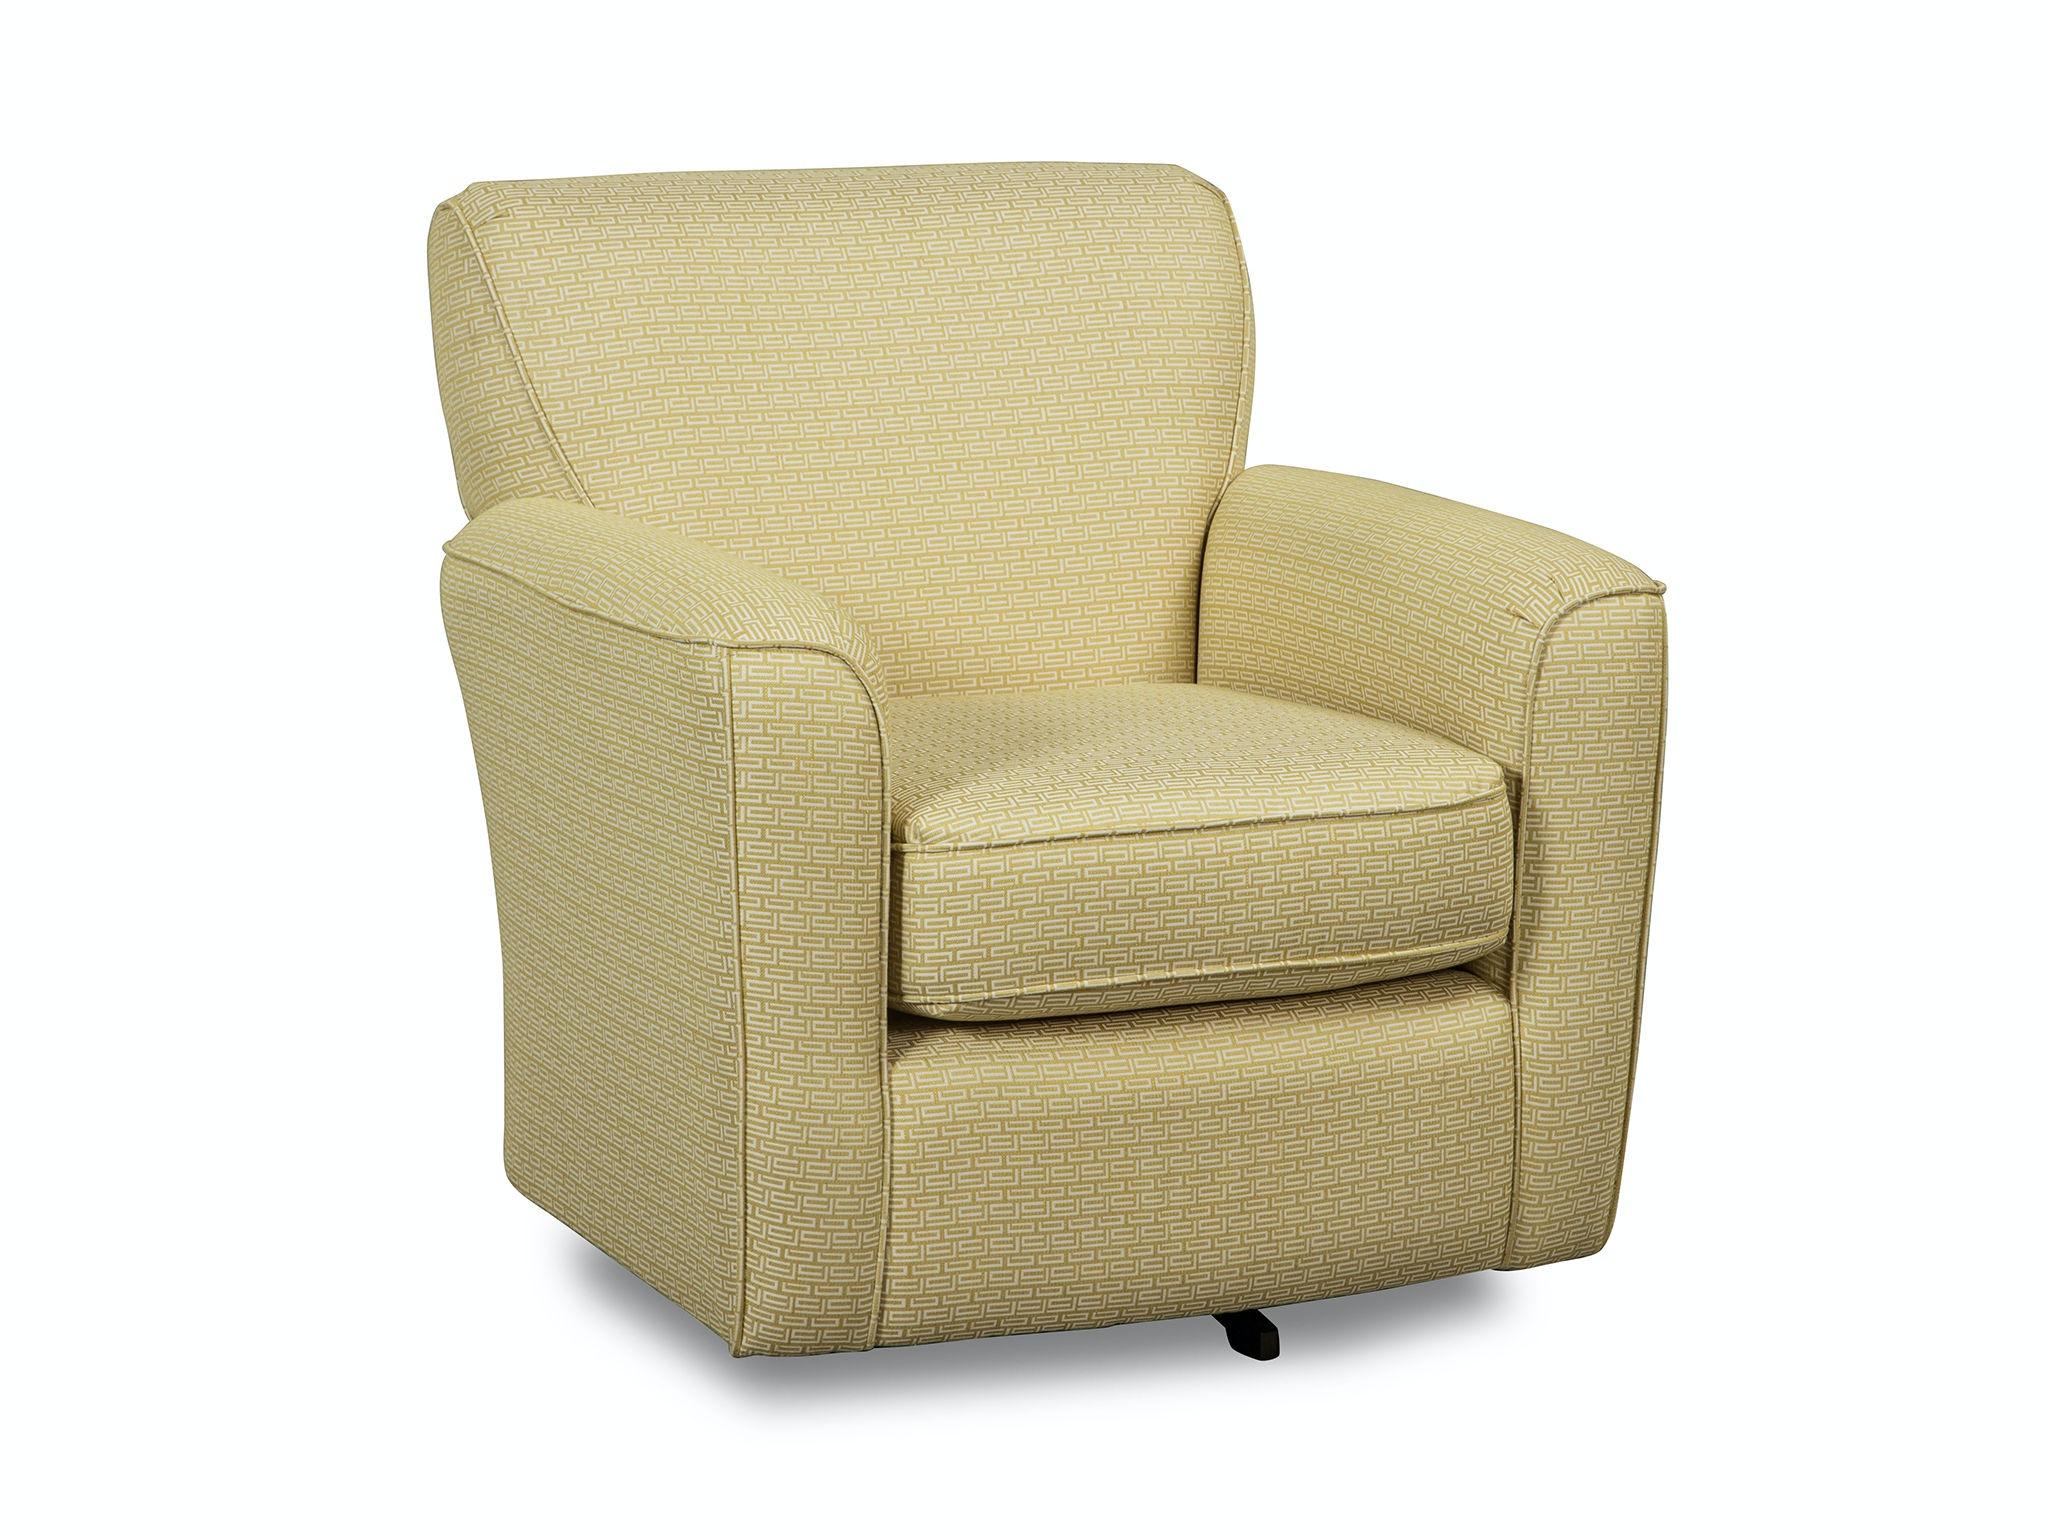 swivel chairs living room coffeehouse la jolla ca 92037 hickorycraft chair 068710